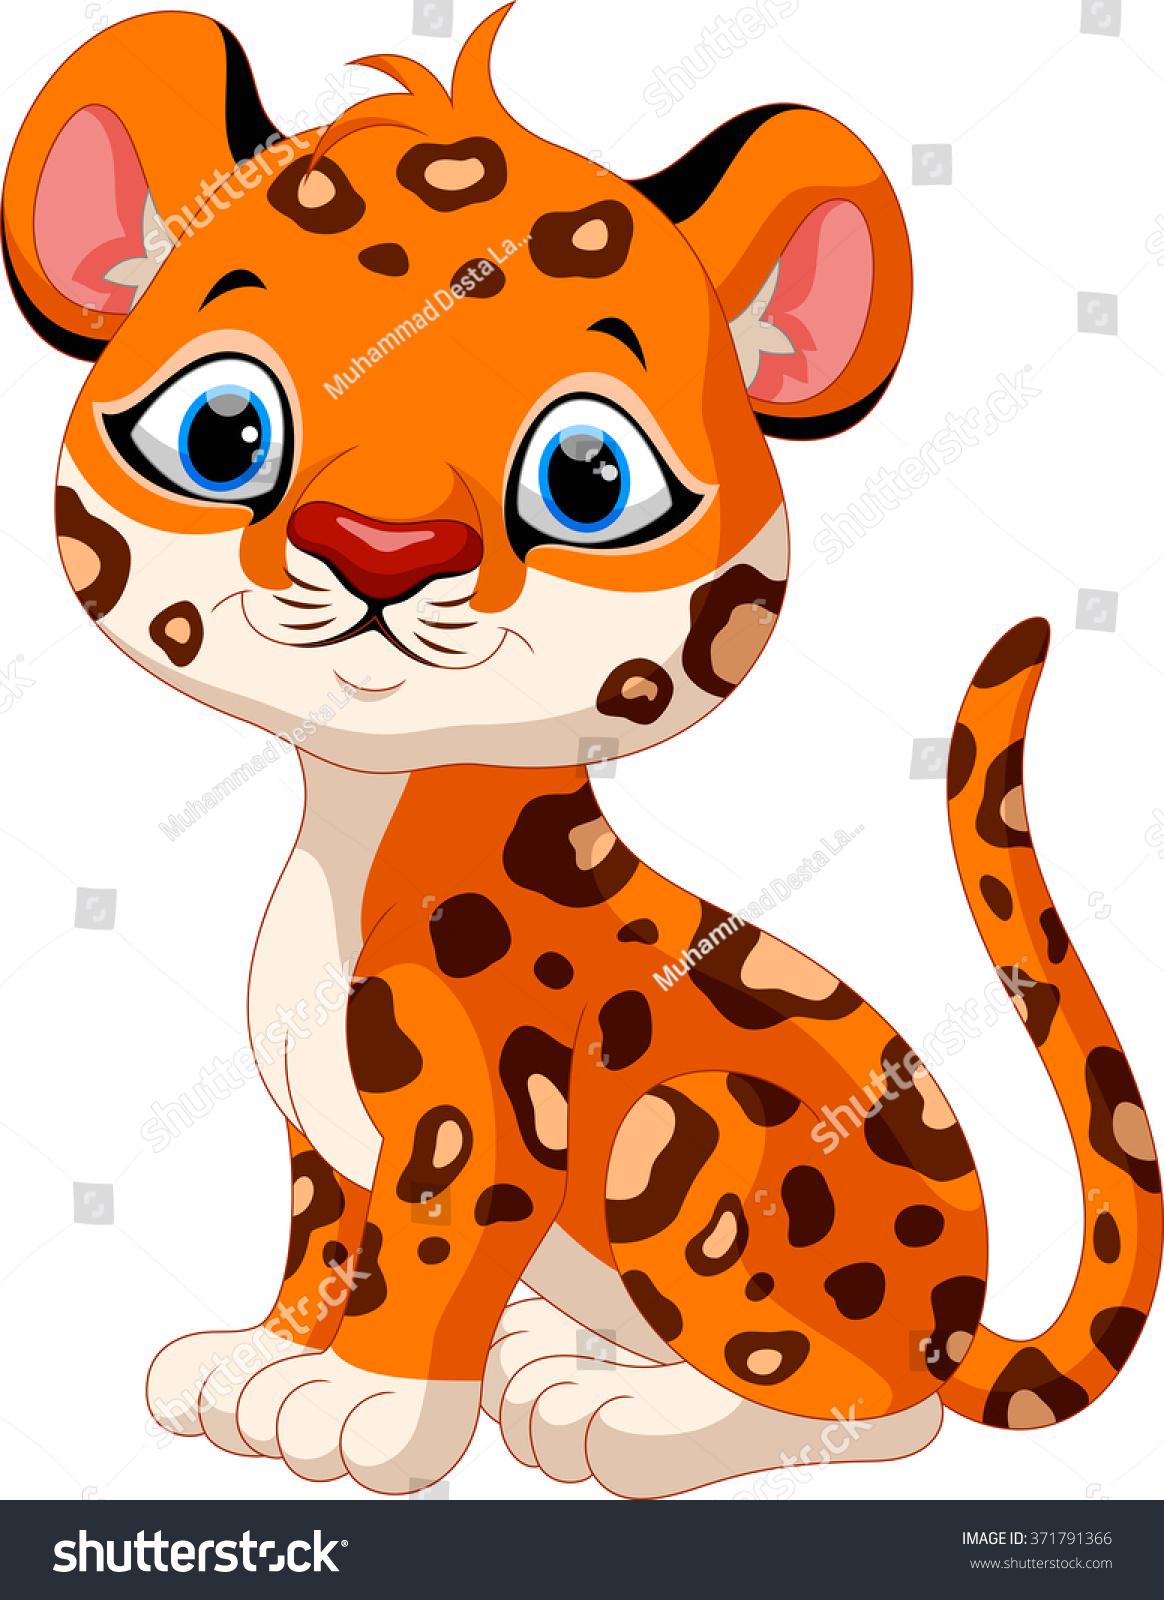 Sitting Cartoon Leopard